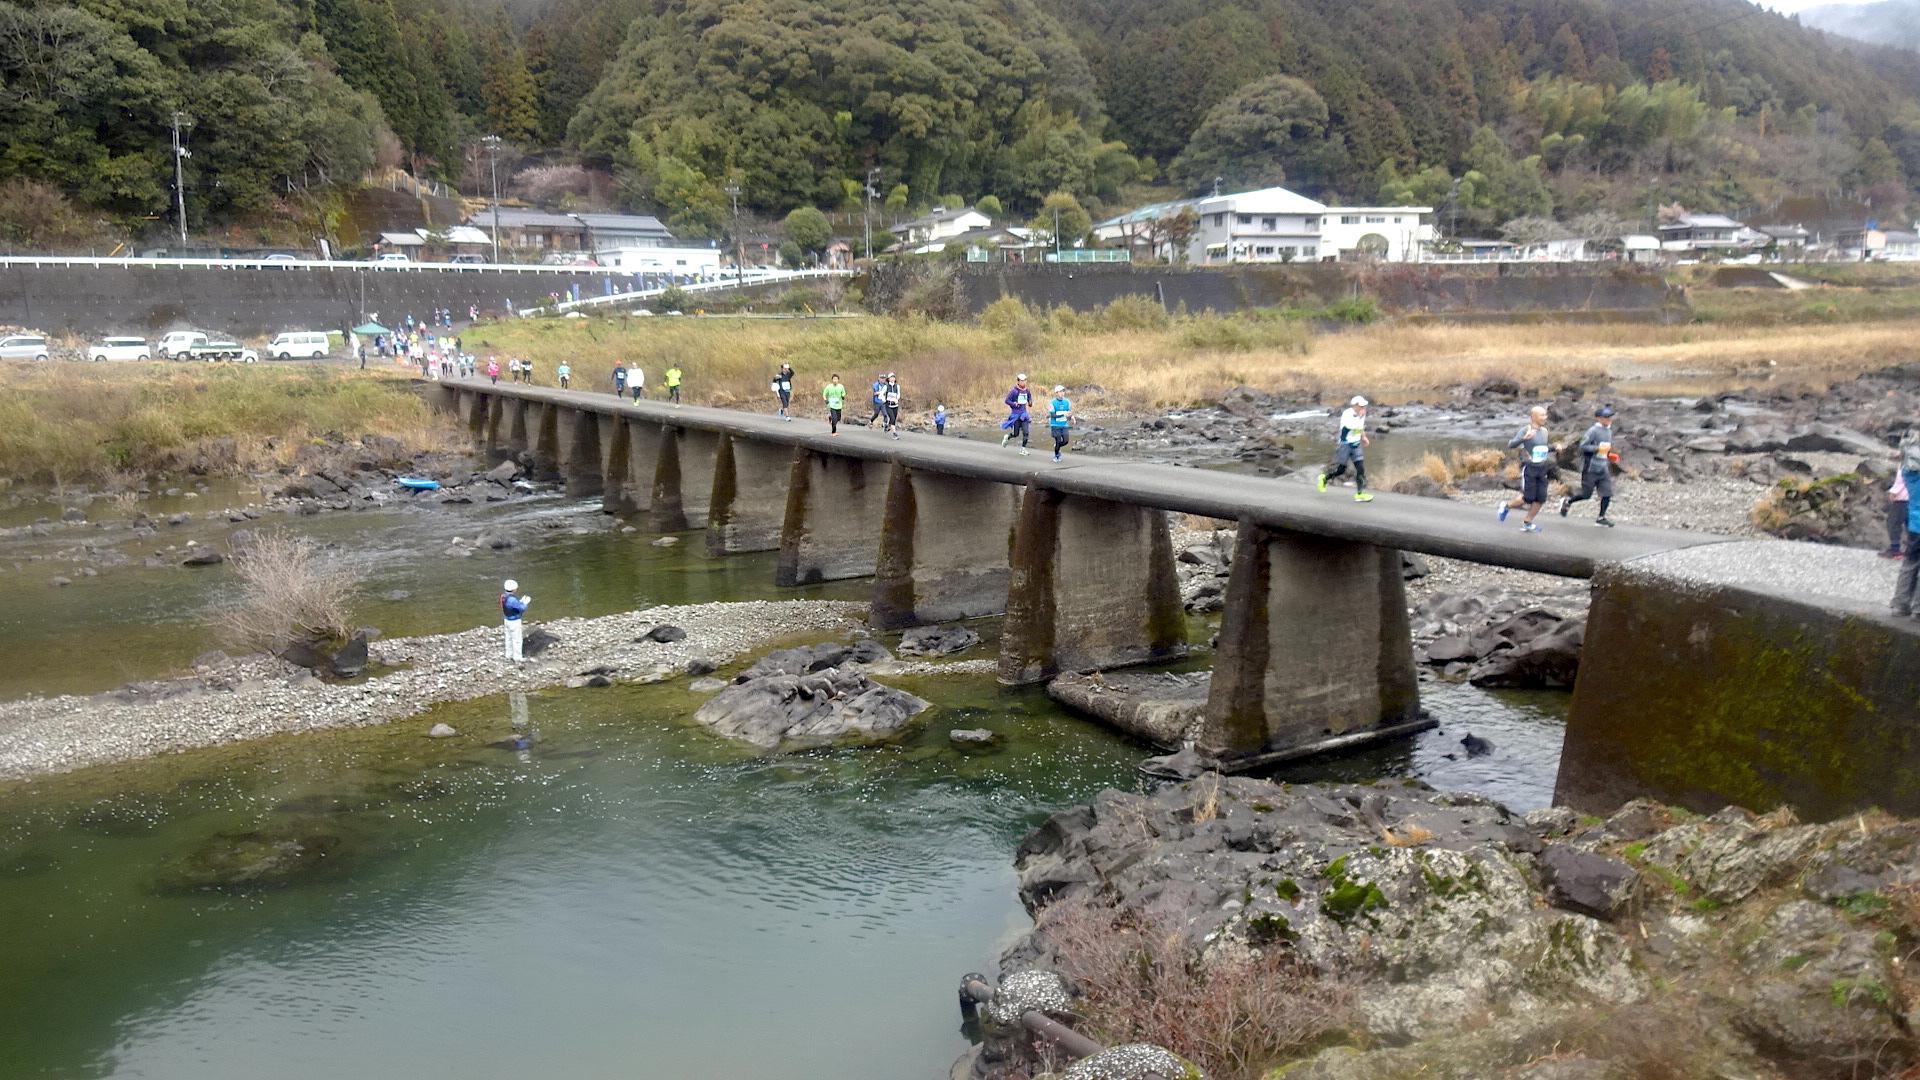 http://cdn-ak.f.st-hatena.com/images/fotolife/s/shioshiohida/20170326/20170326102105_original.jpg